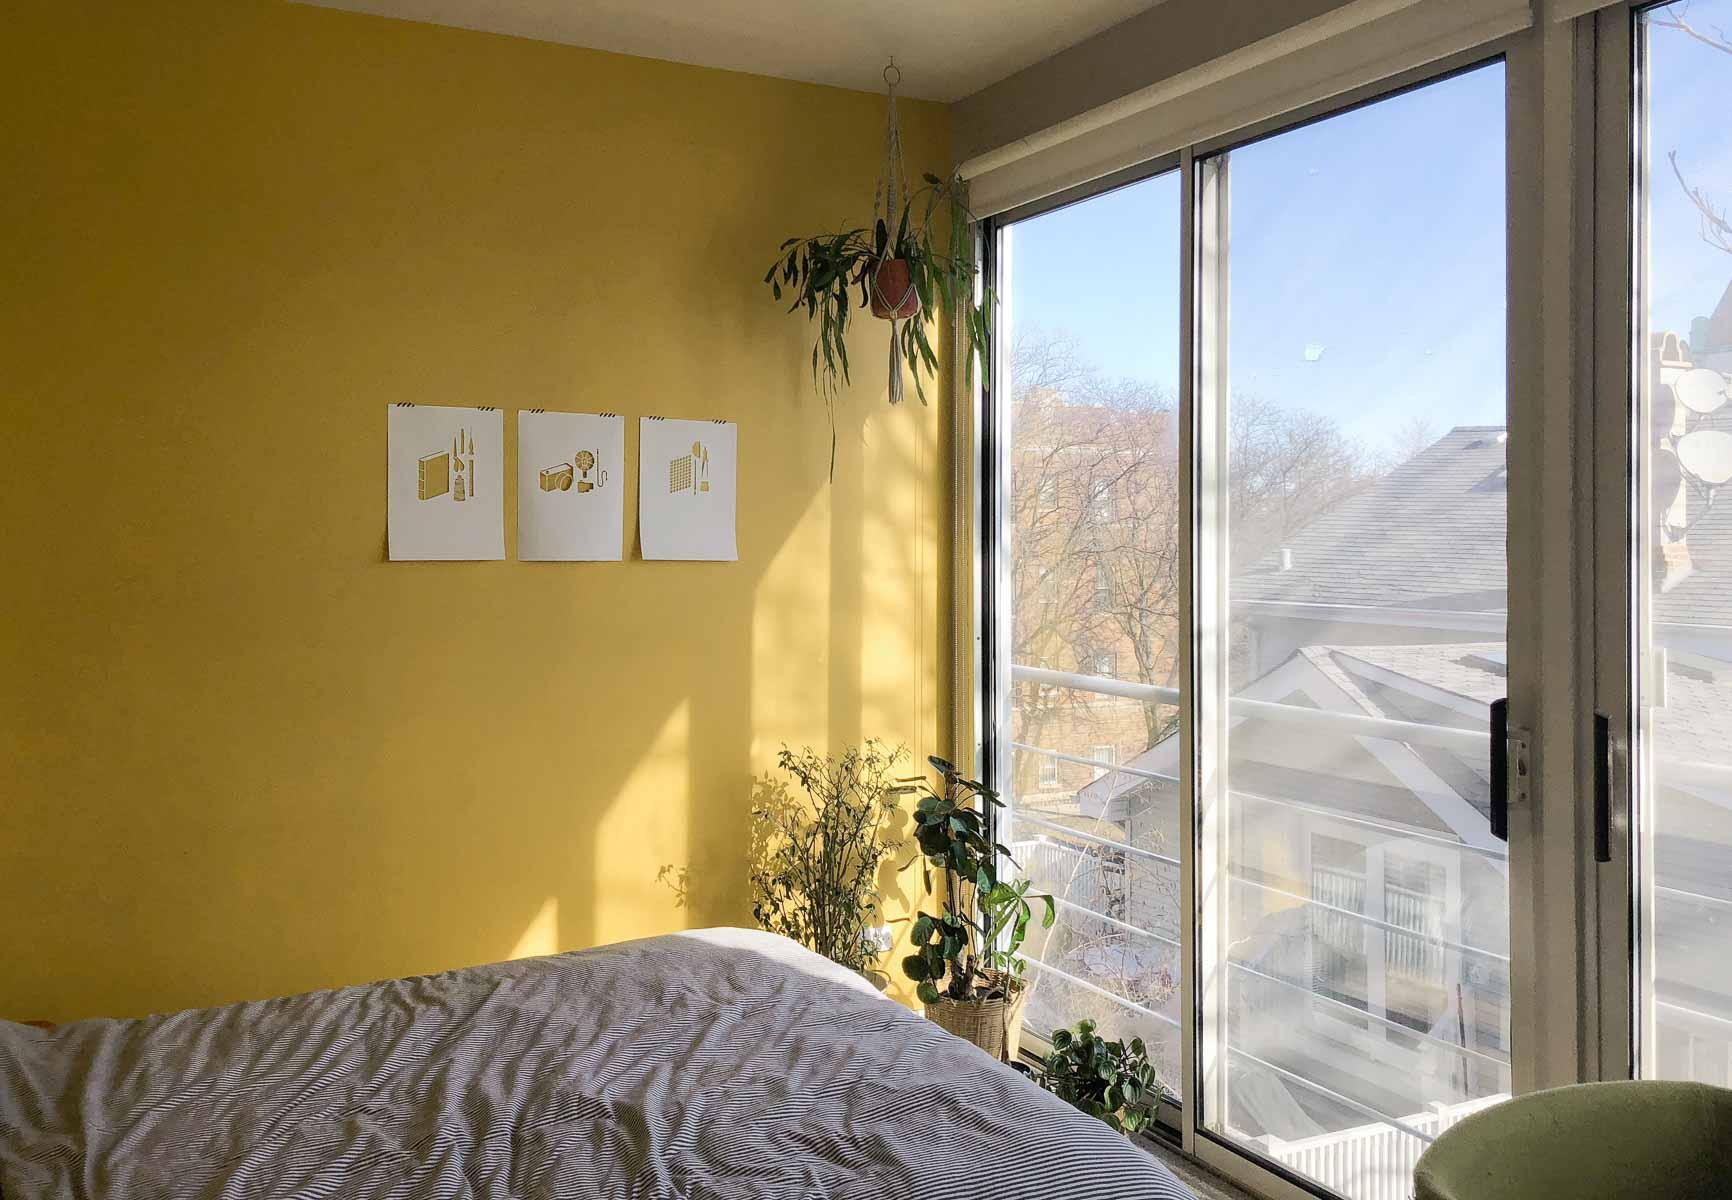 Sunny-Day-homestudiolist-Los-Angeles-LA-photoshoot-location-natural-light-southern-california-3.jpg